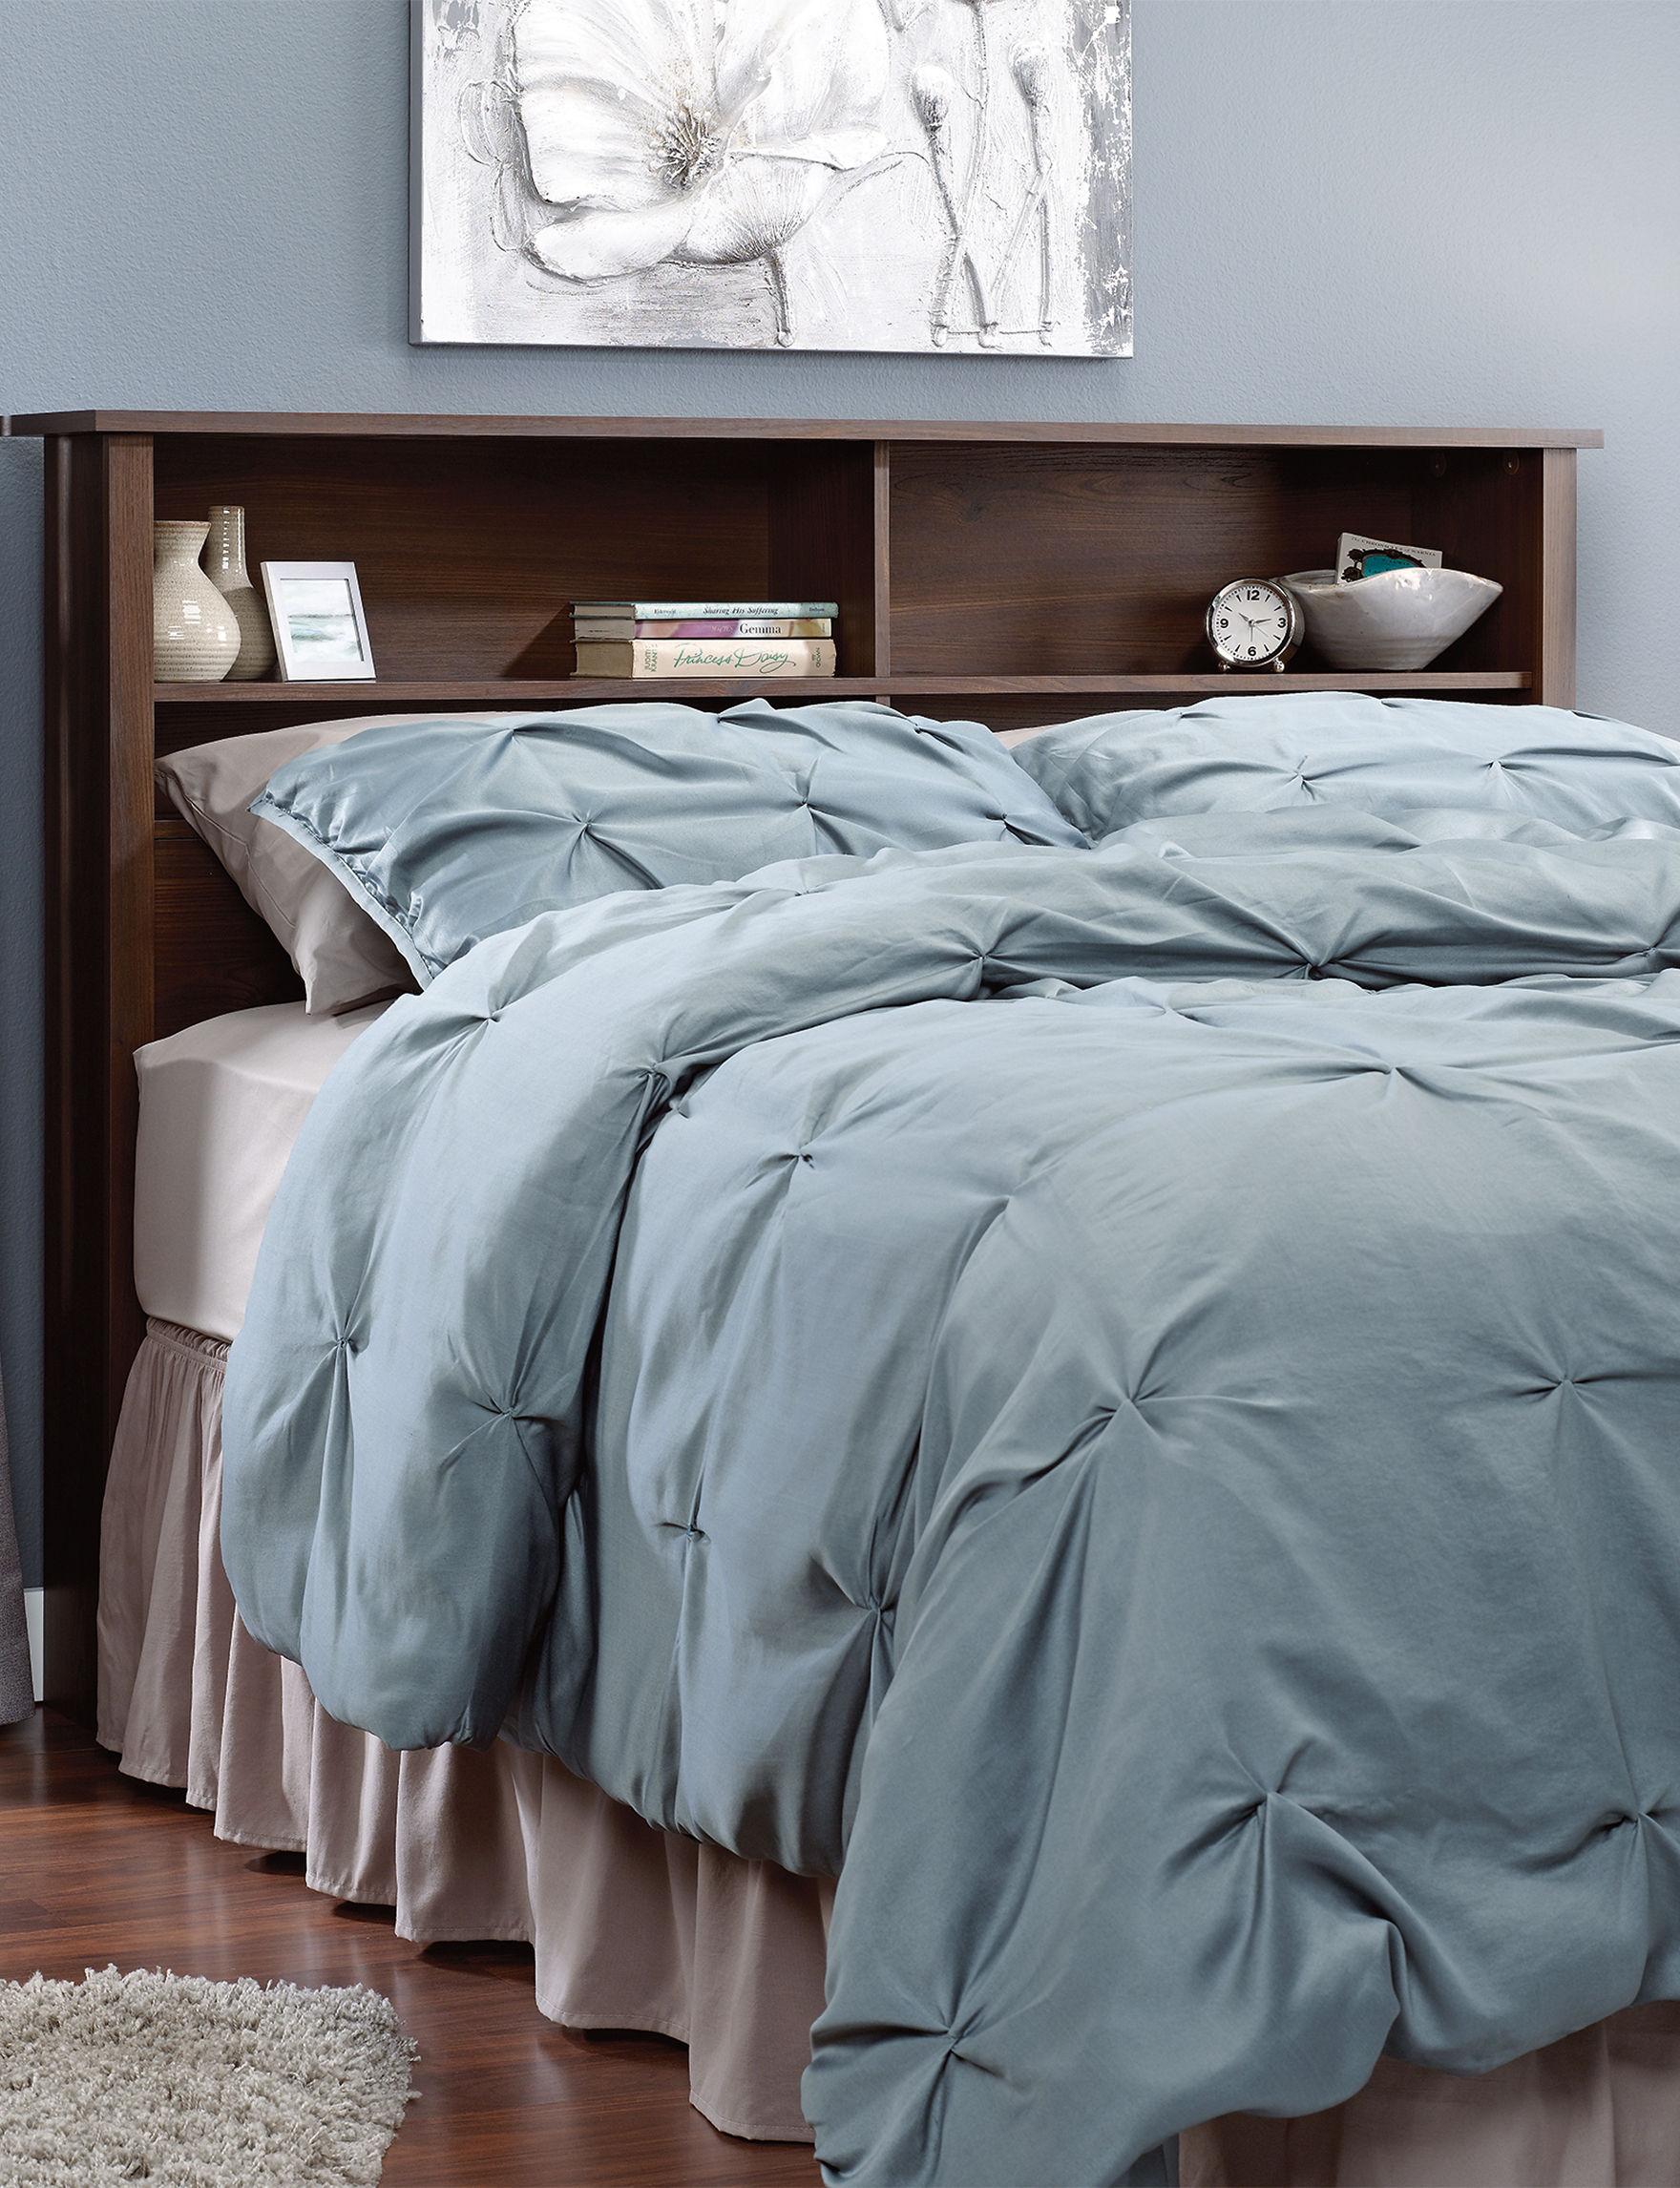 Sauder Brown Beds & Headboards Bedroom Furniture